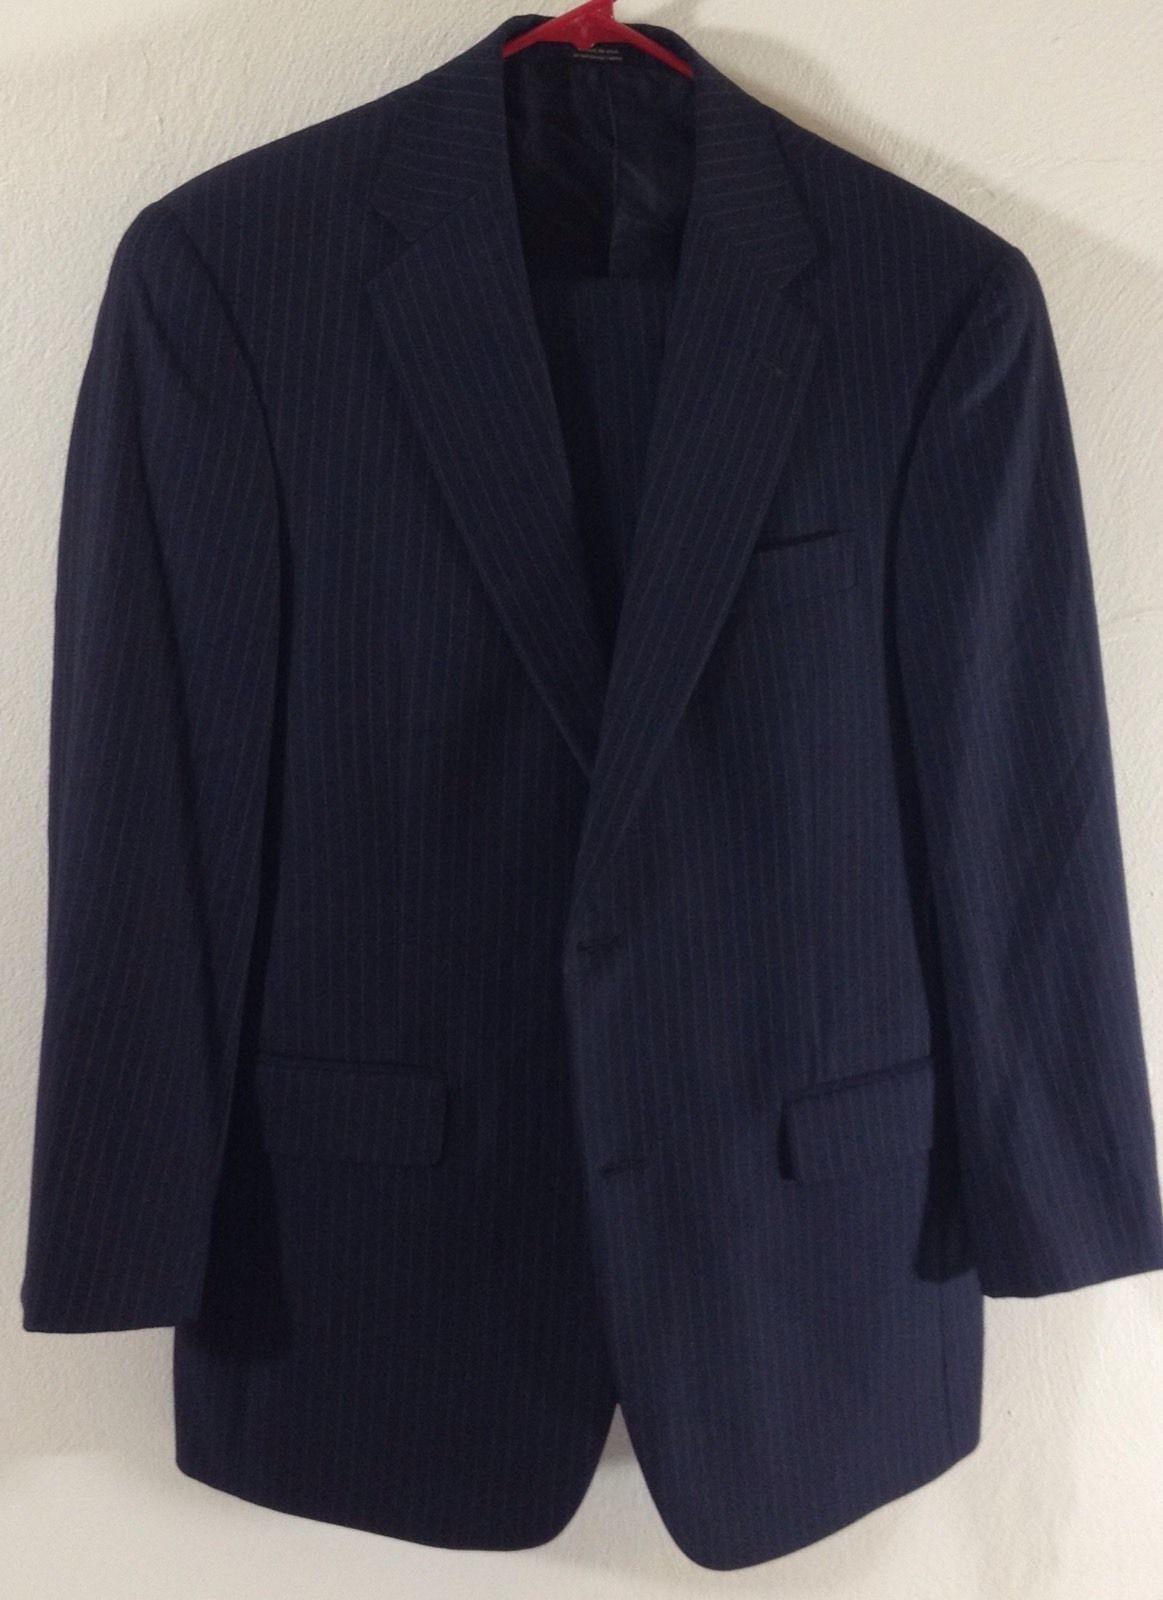 Hart Schaffner & Marx gold Trumpeter 40R Wool Suit bluee Striped 30W 27L